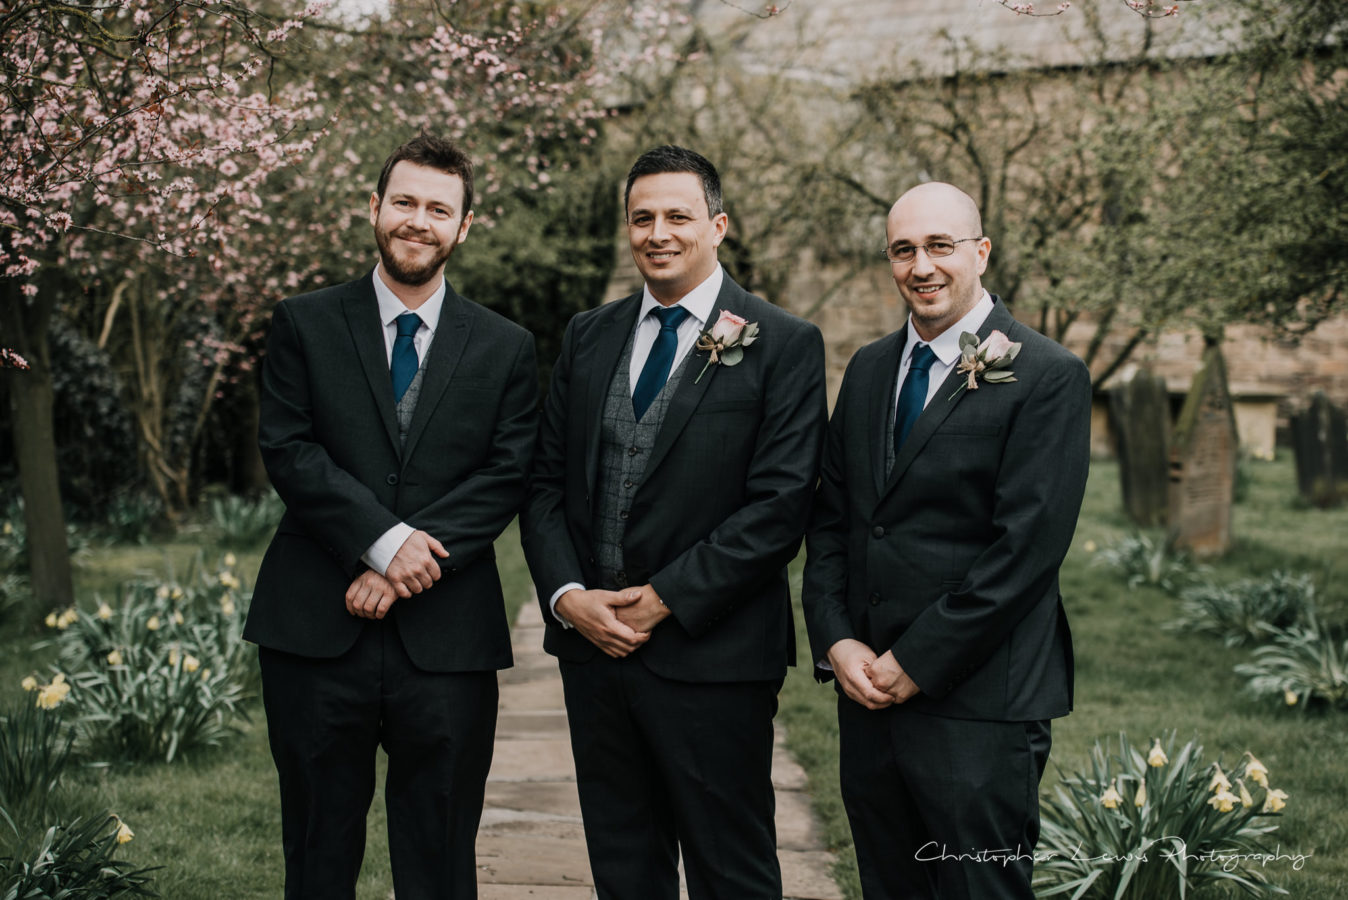 Thief-Hall-Wedding-Christopher-Lewis-Photography-12